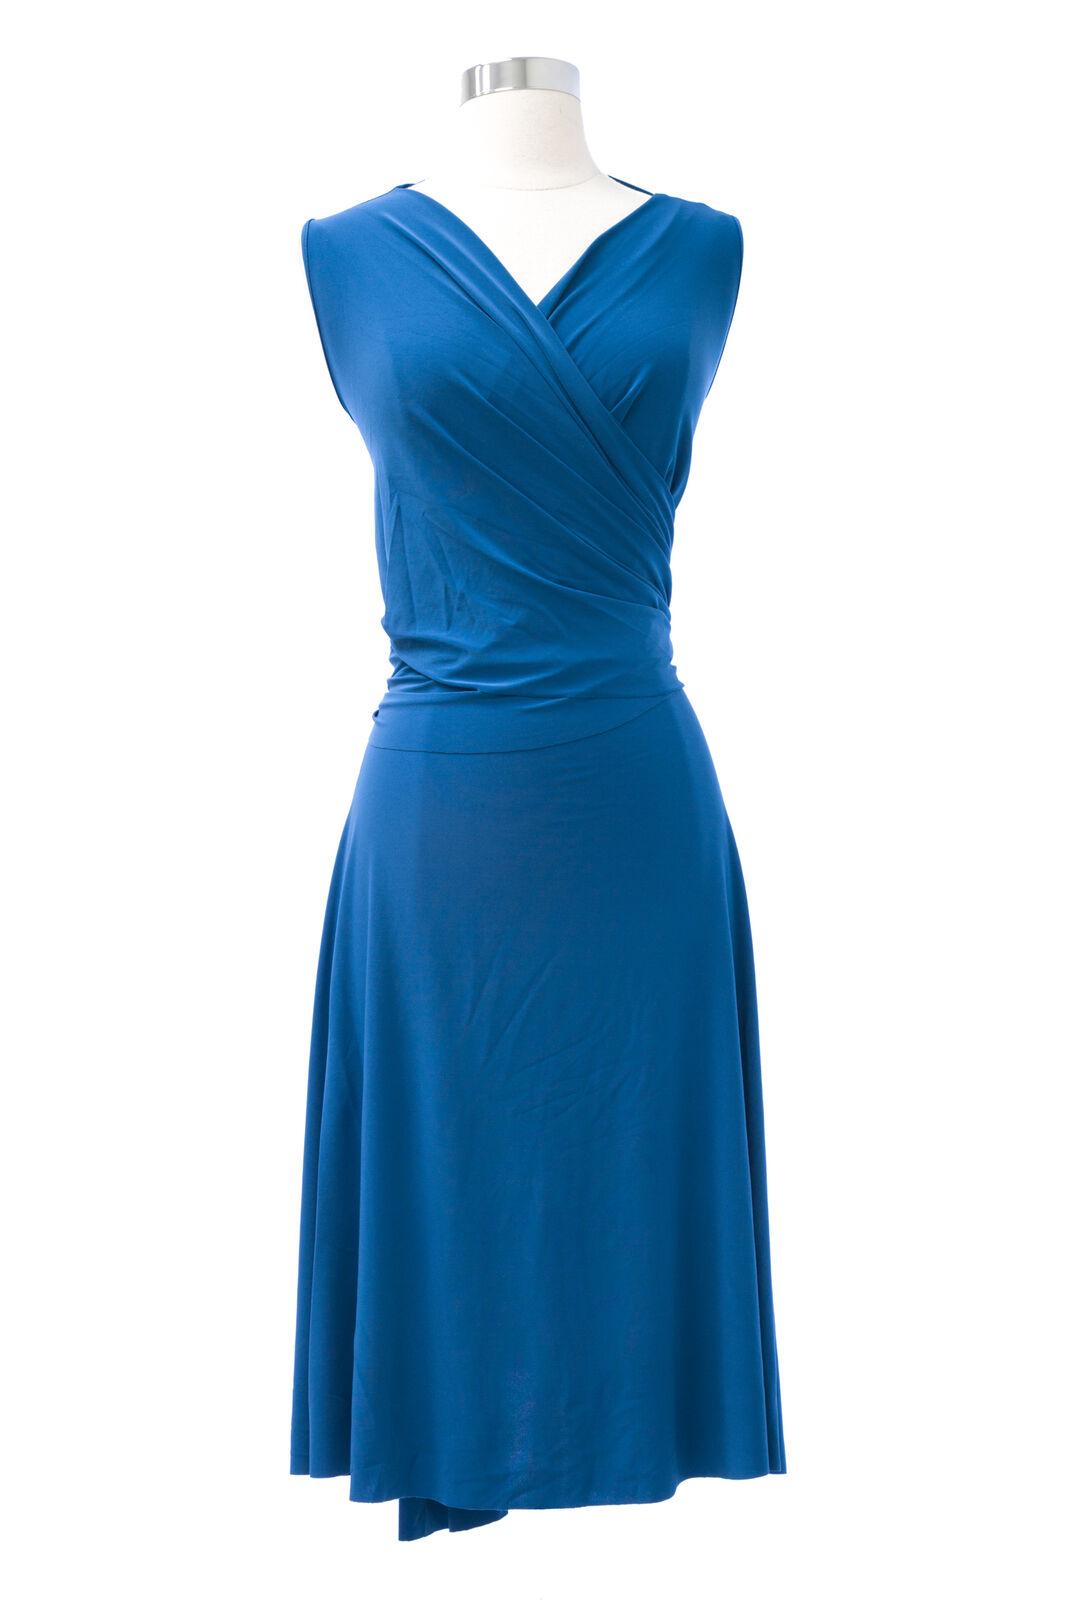 VON VONNI Women's Teal Sleeveless Wrap Dress 1003AAP Sz s NEW